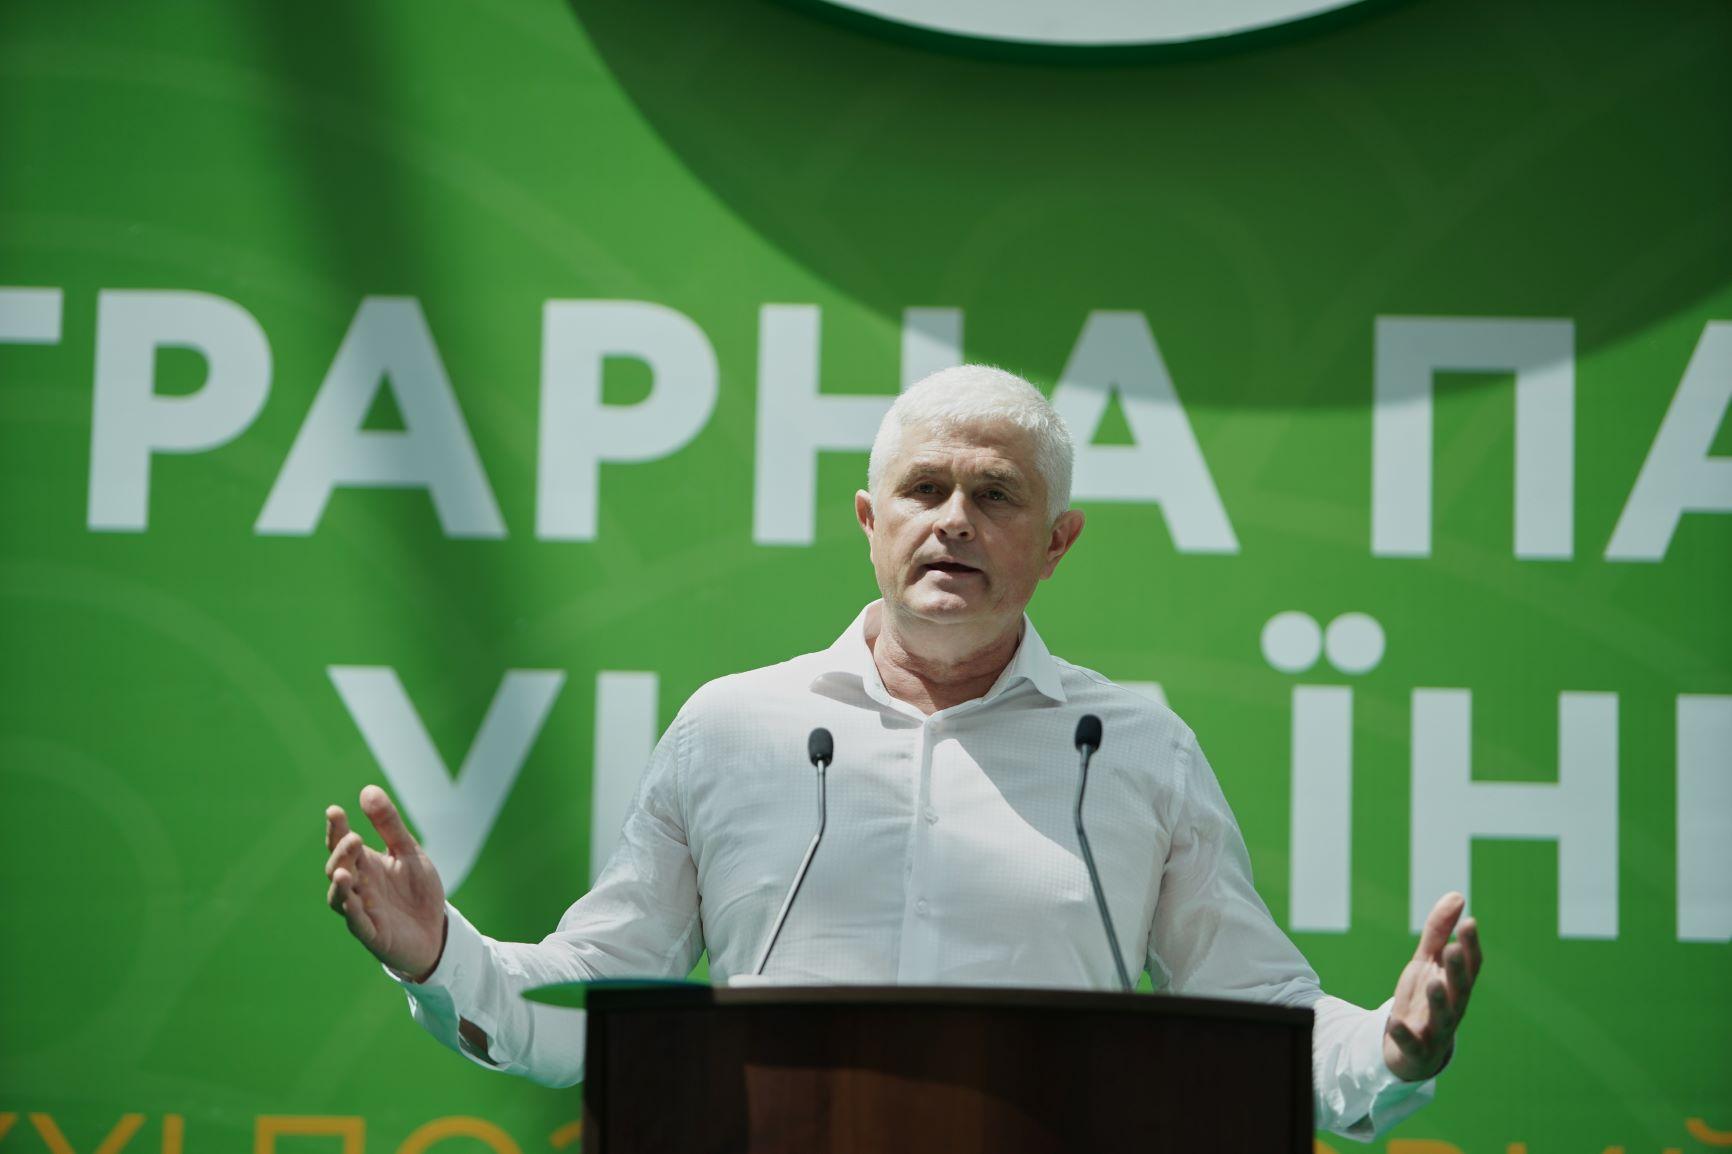 https://agroparty.org.ua/wp-content/uploads/2019/06/GATE_121119_AR_09269.jpg